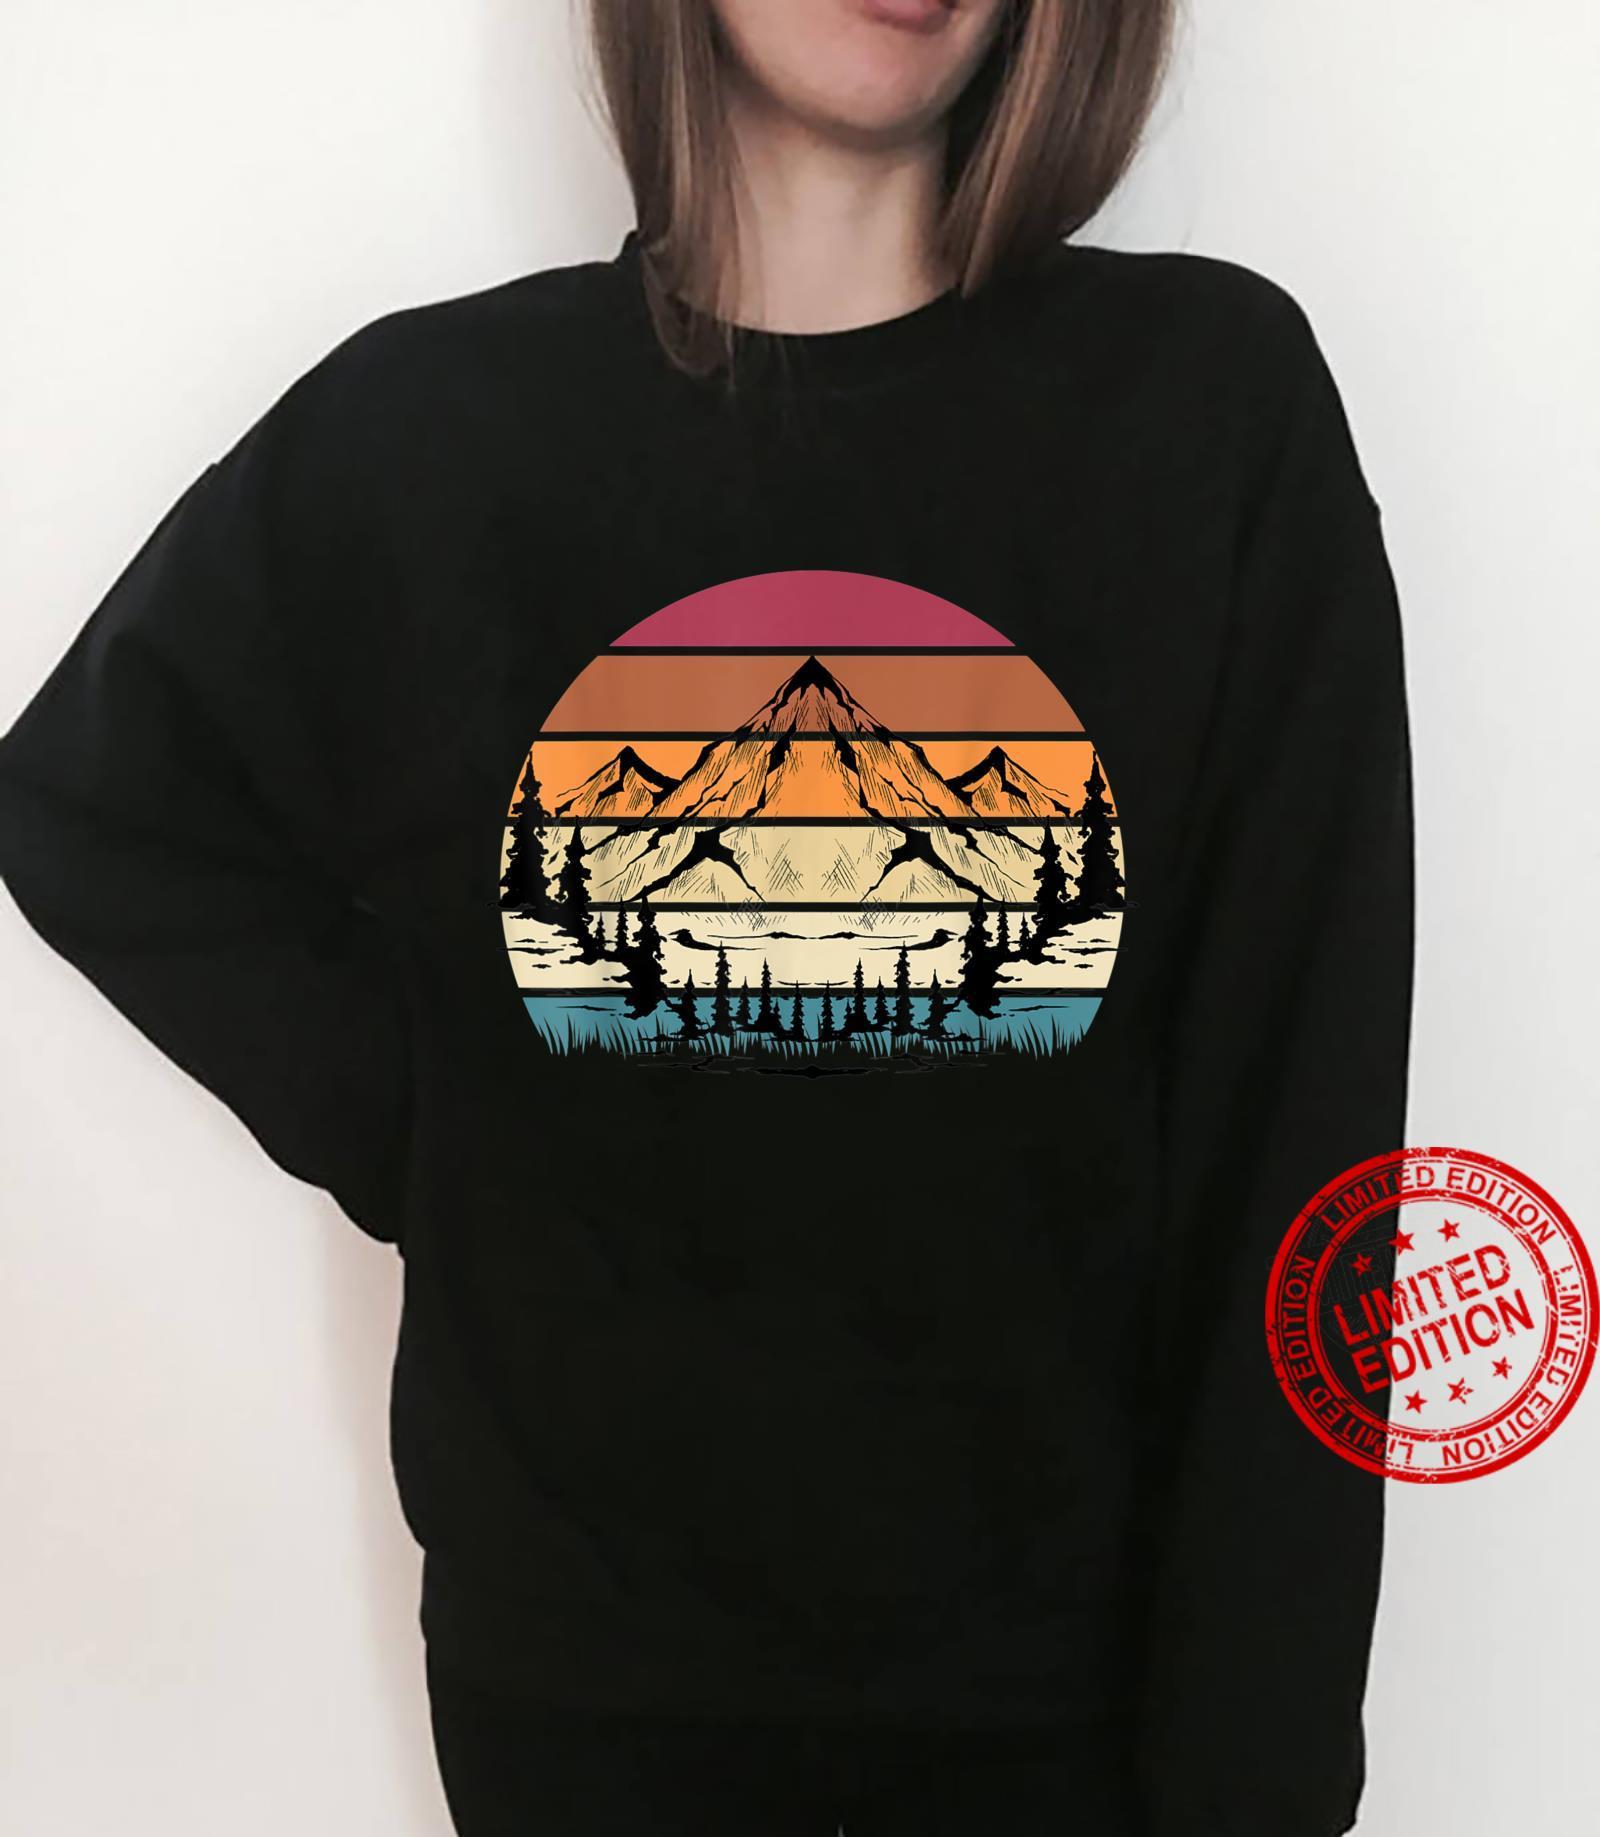 Retro Mountain Hike Hobby Sport Hiker Camping Hiking Shirt sweater